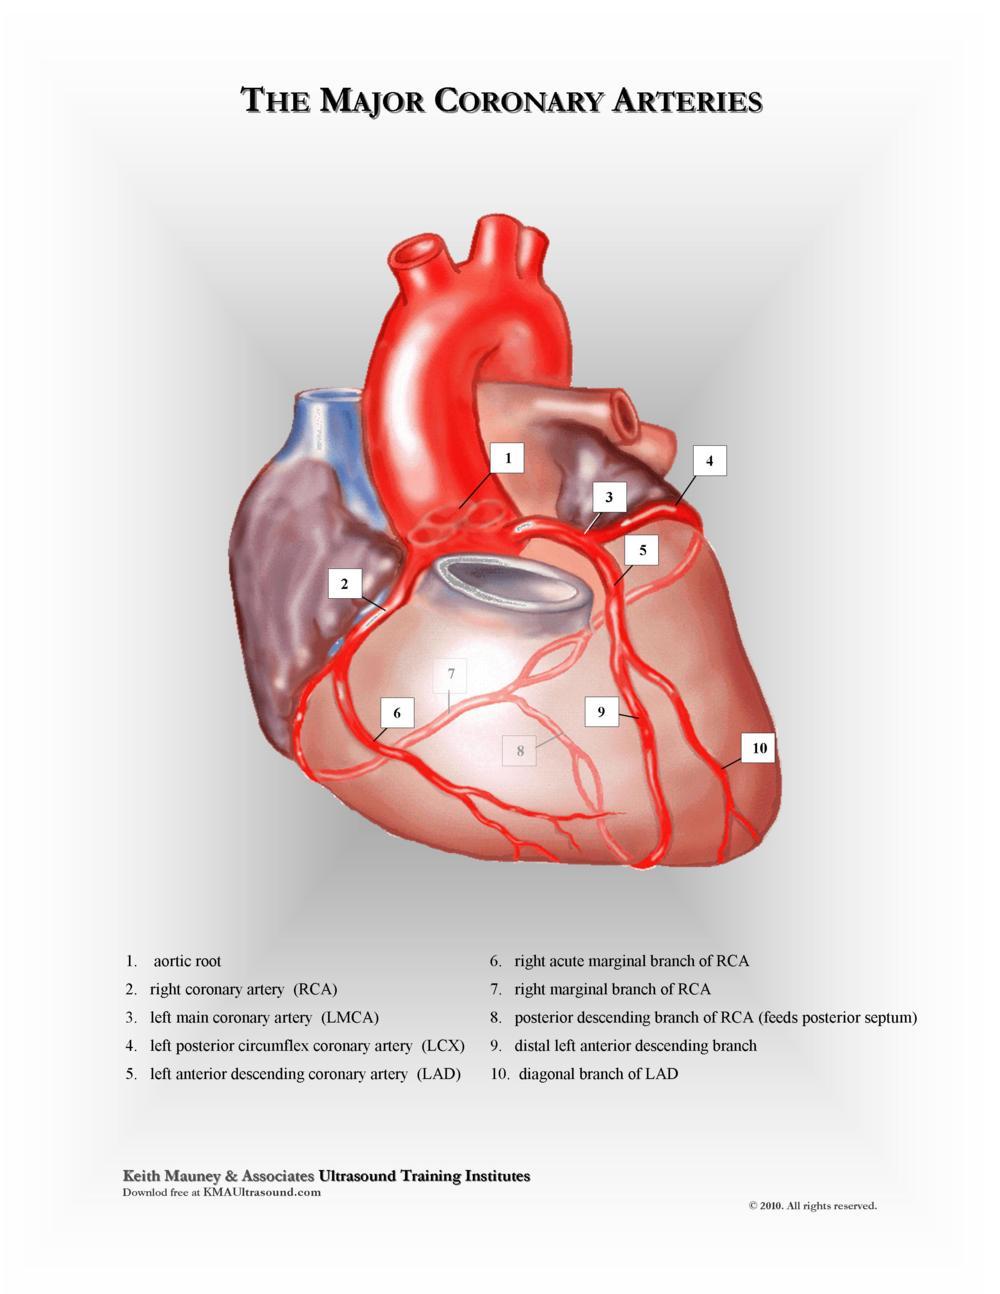 KMA Ultrasound Major Coronary Arteries